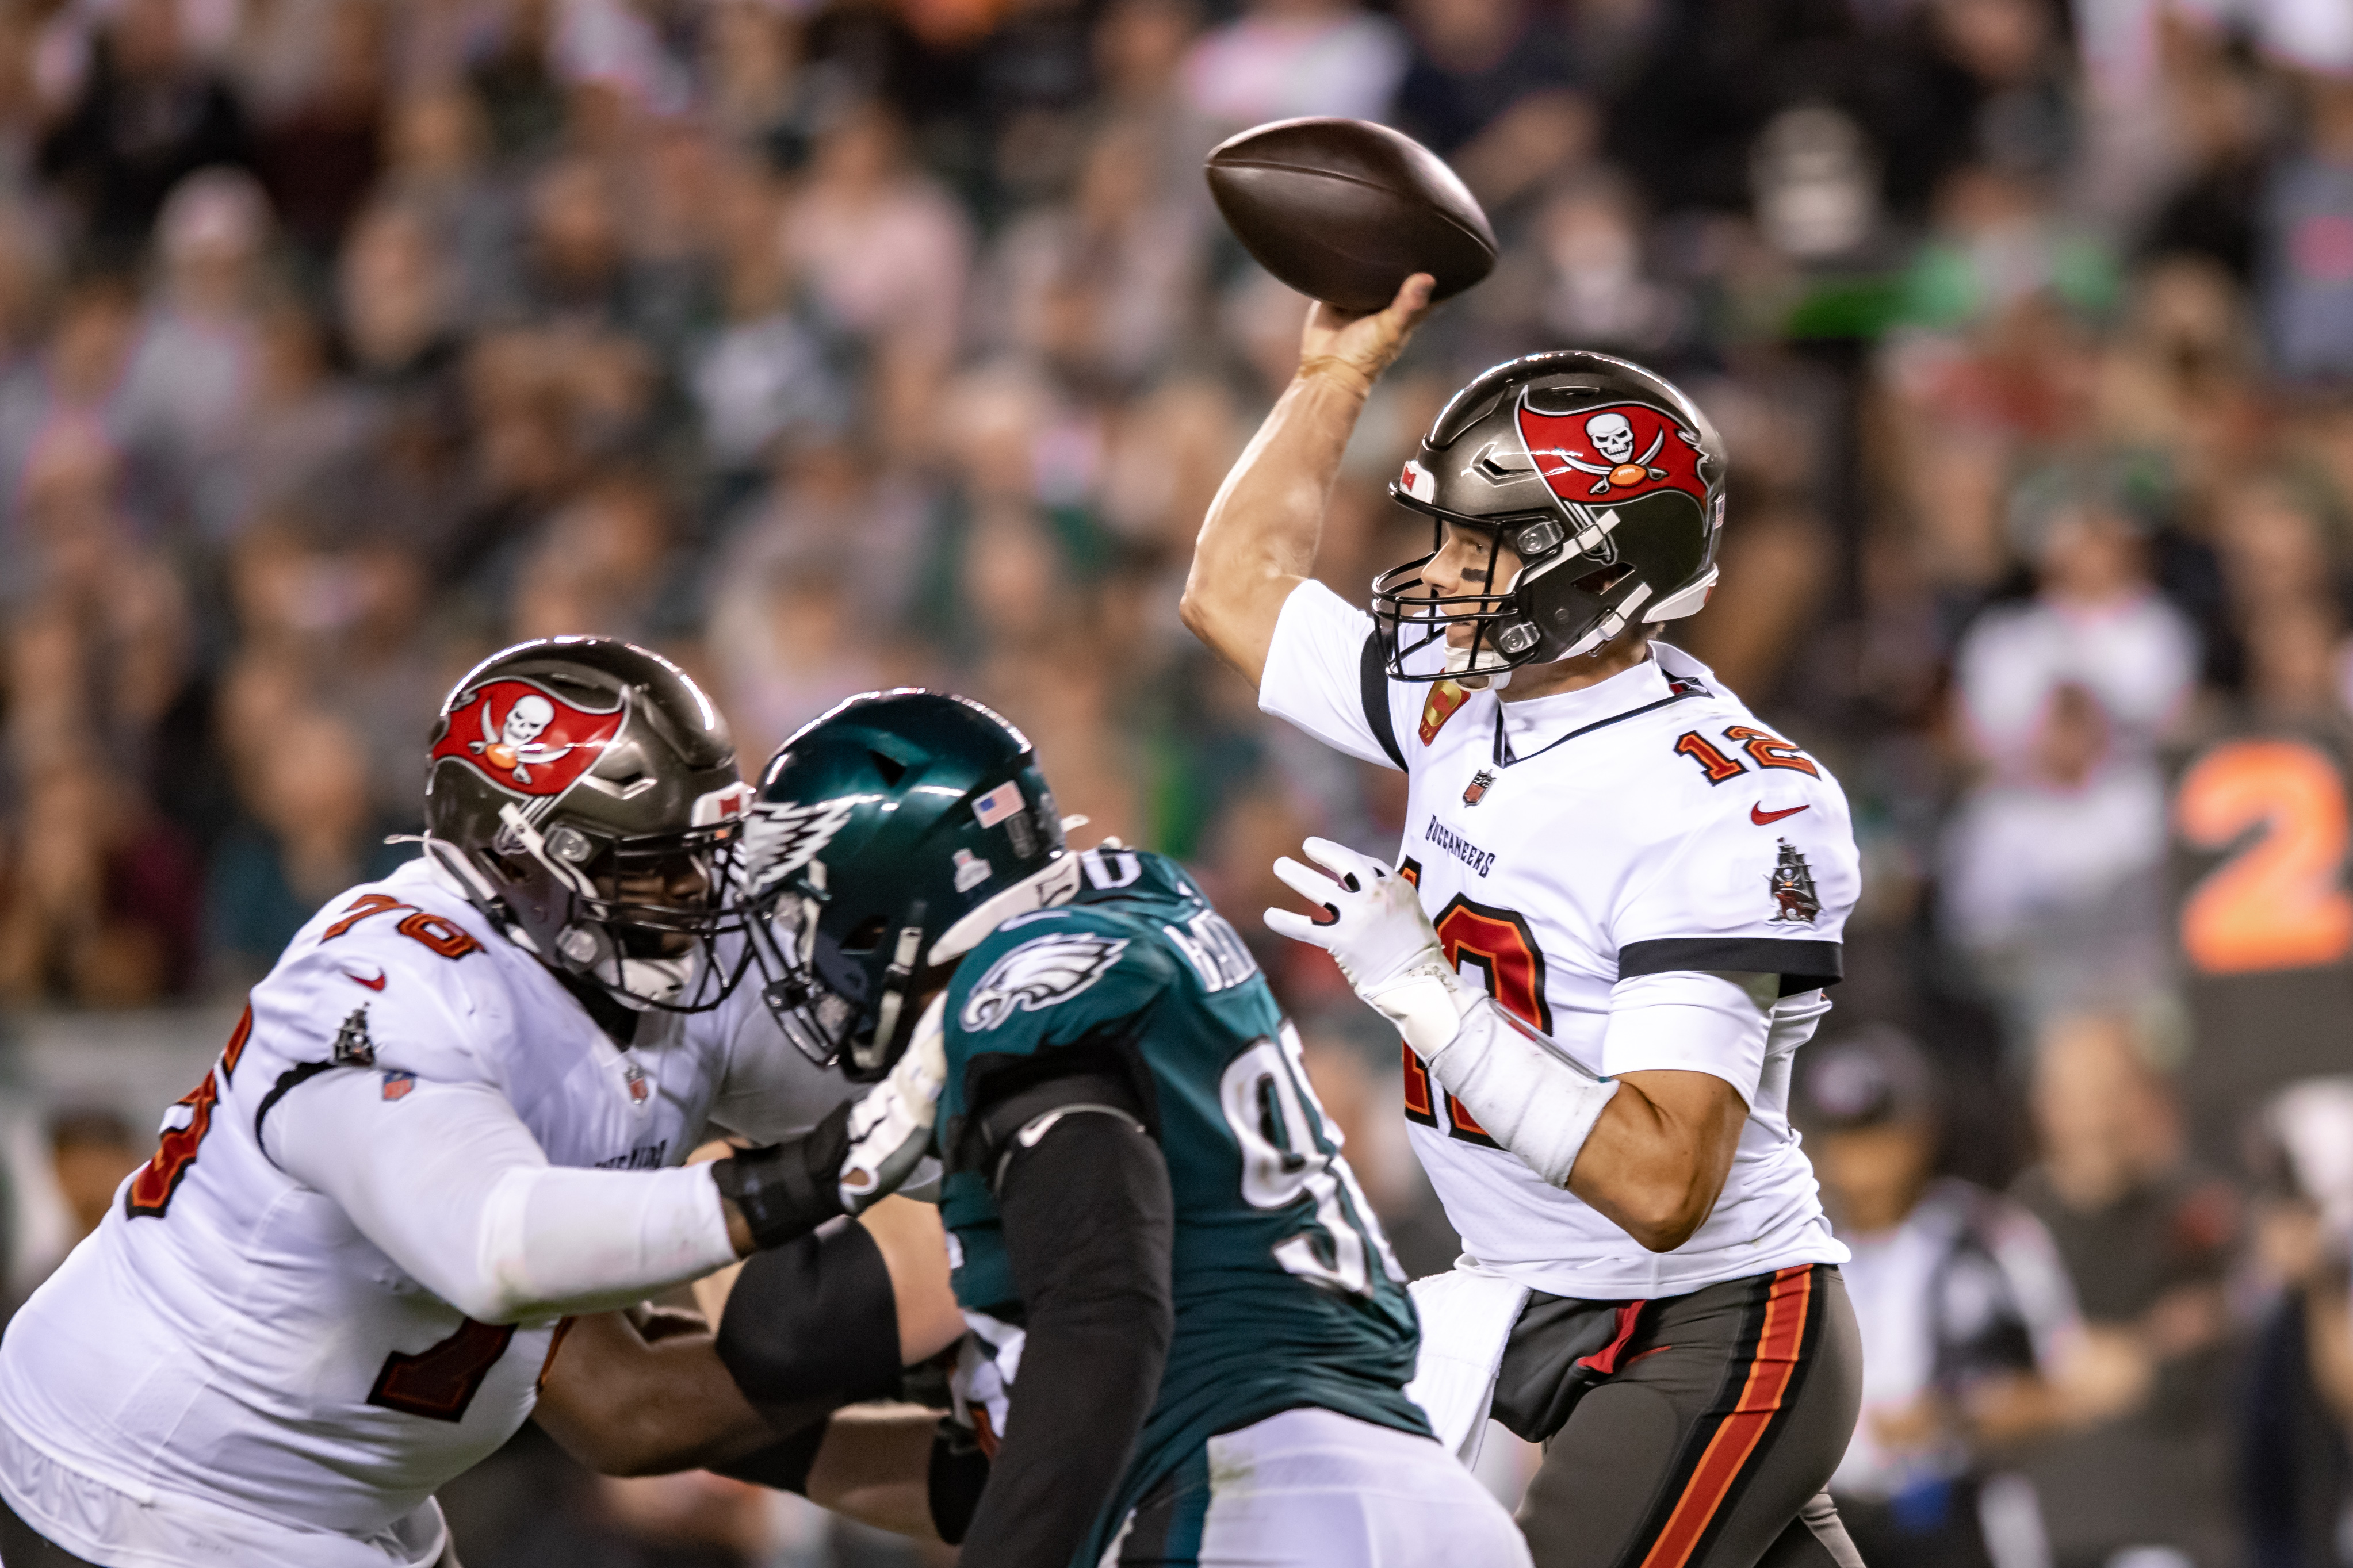 NFL: OCT 14 Buccaneers at Eagles